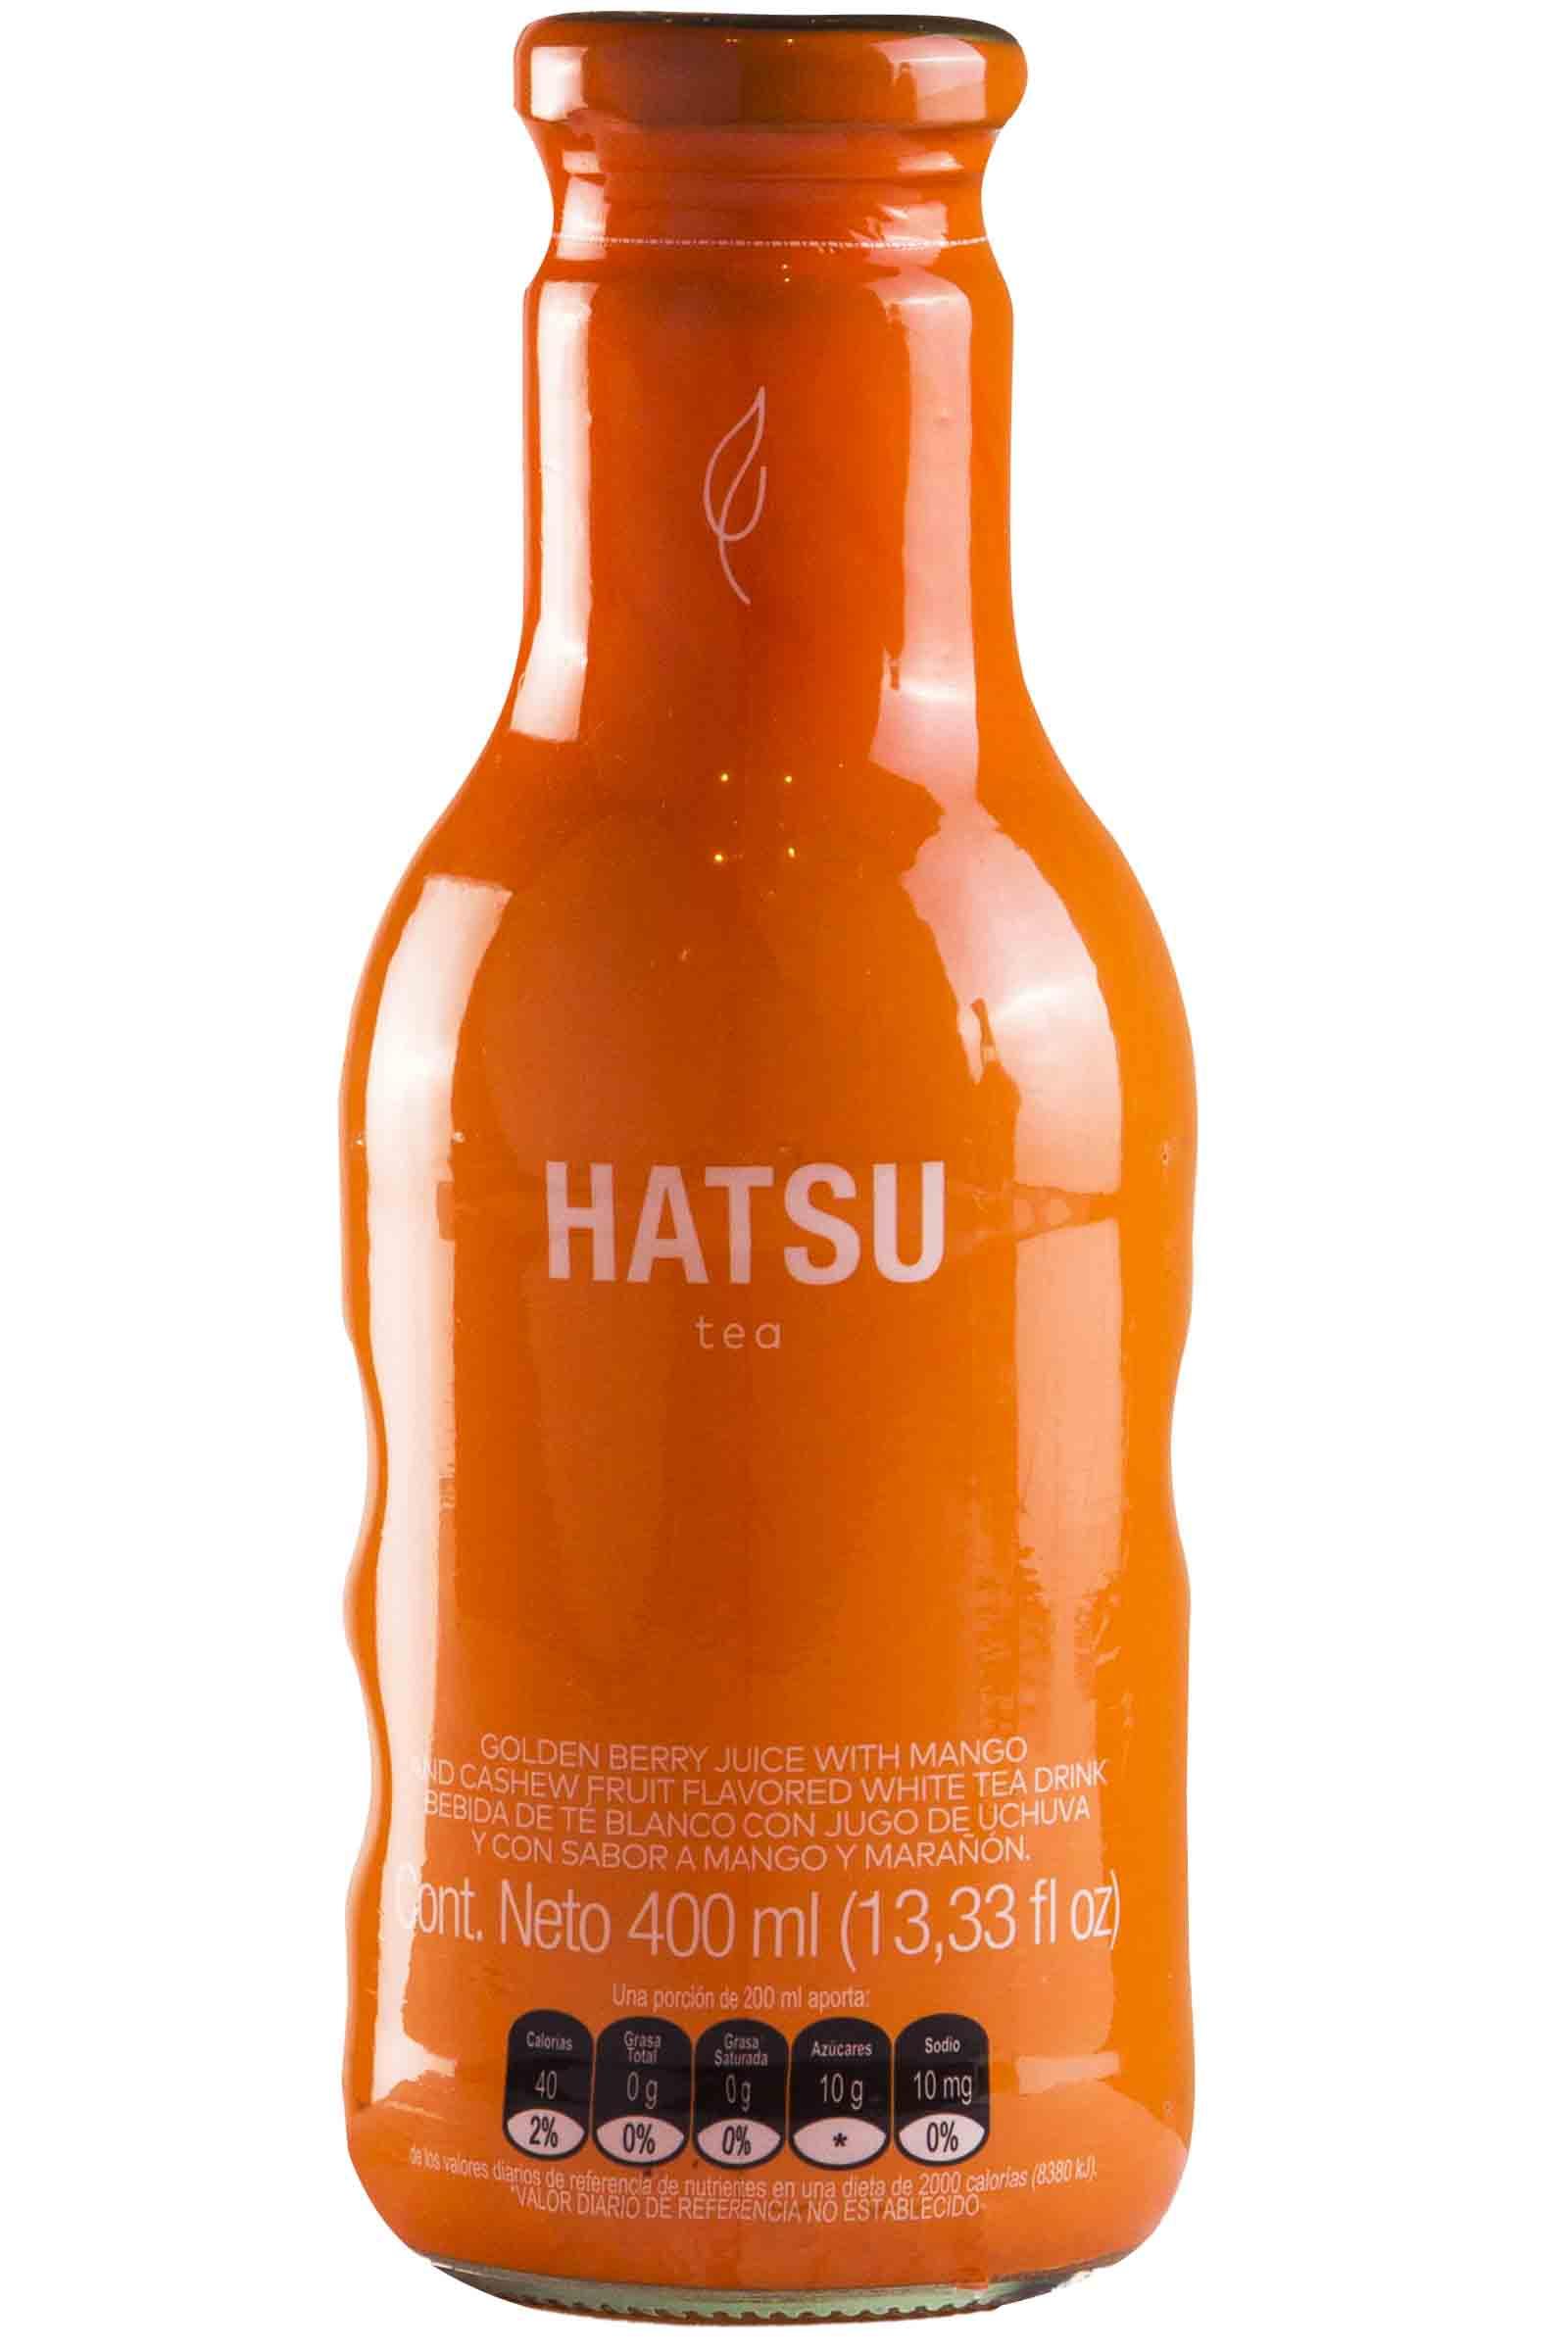 Hatsu Té Naranja Sabor Mango y Marañon 400ml